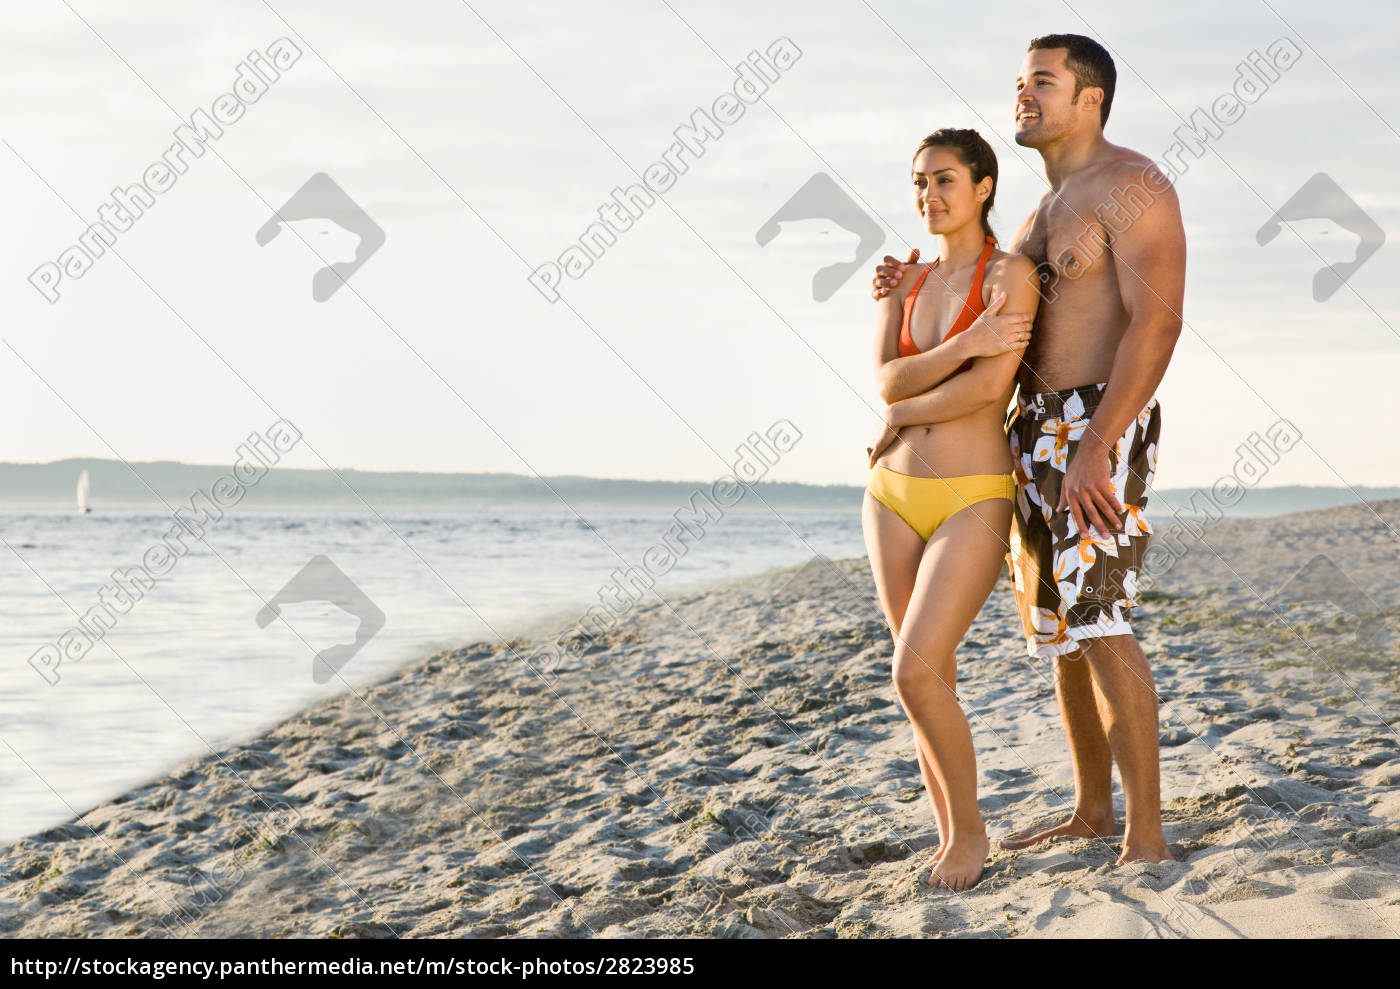 woman, humans, human beings, people, folk, persons - 2823985